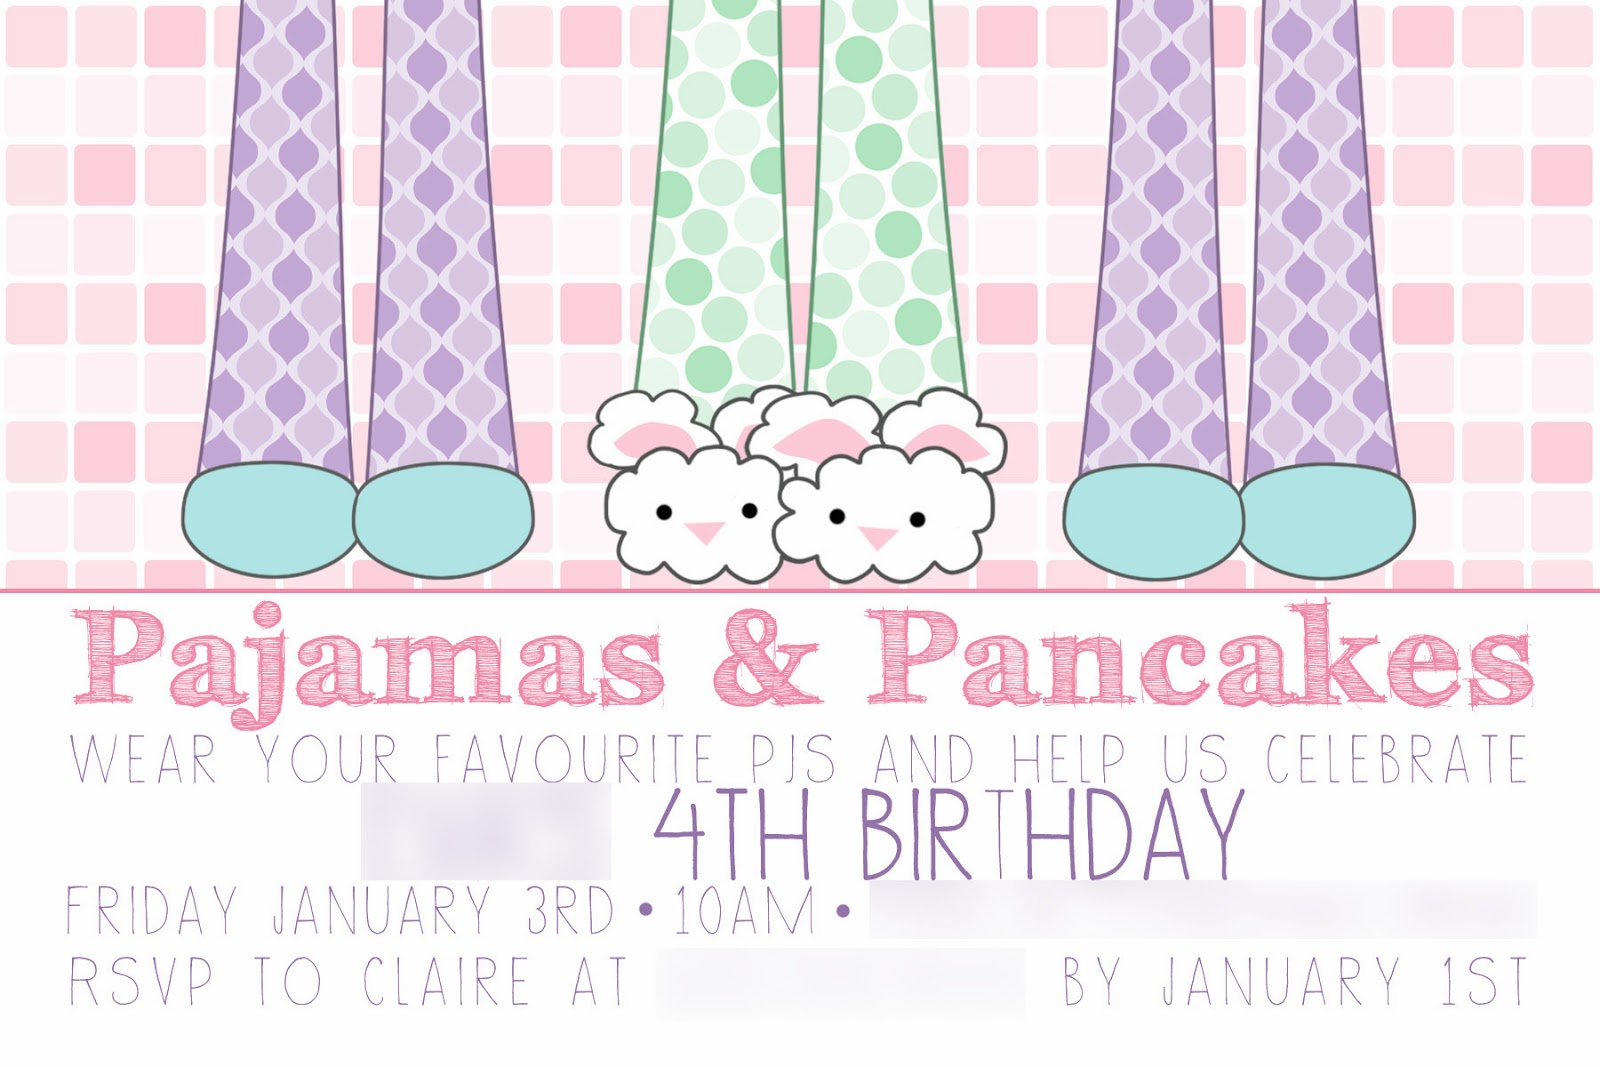 CLAIRE & CREW: Pancakes & Pajamas | A Fourth Birthday Celebration